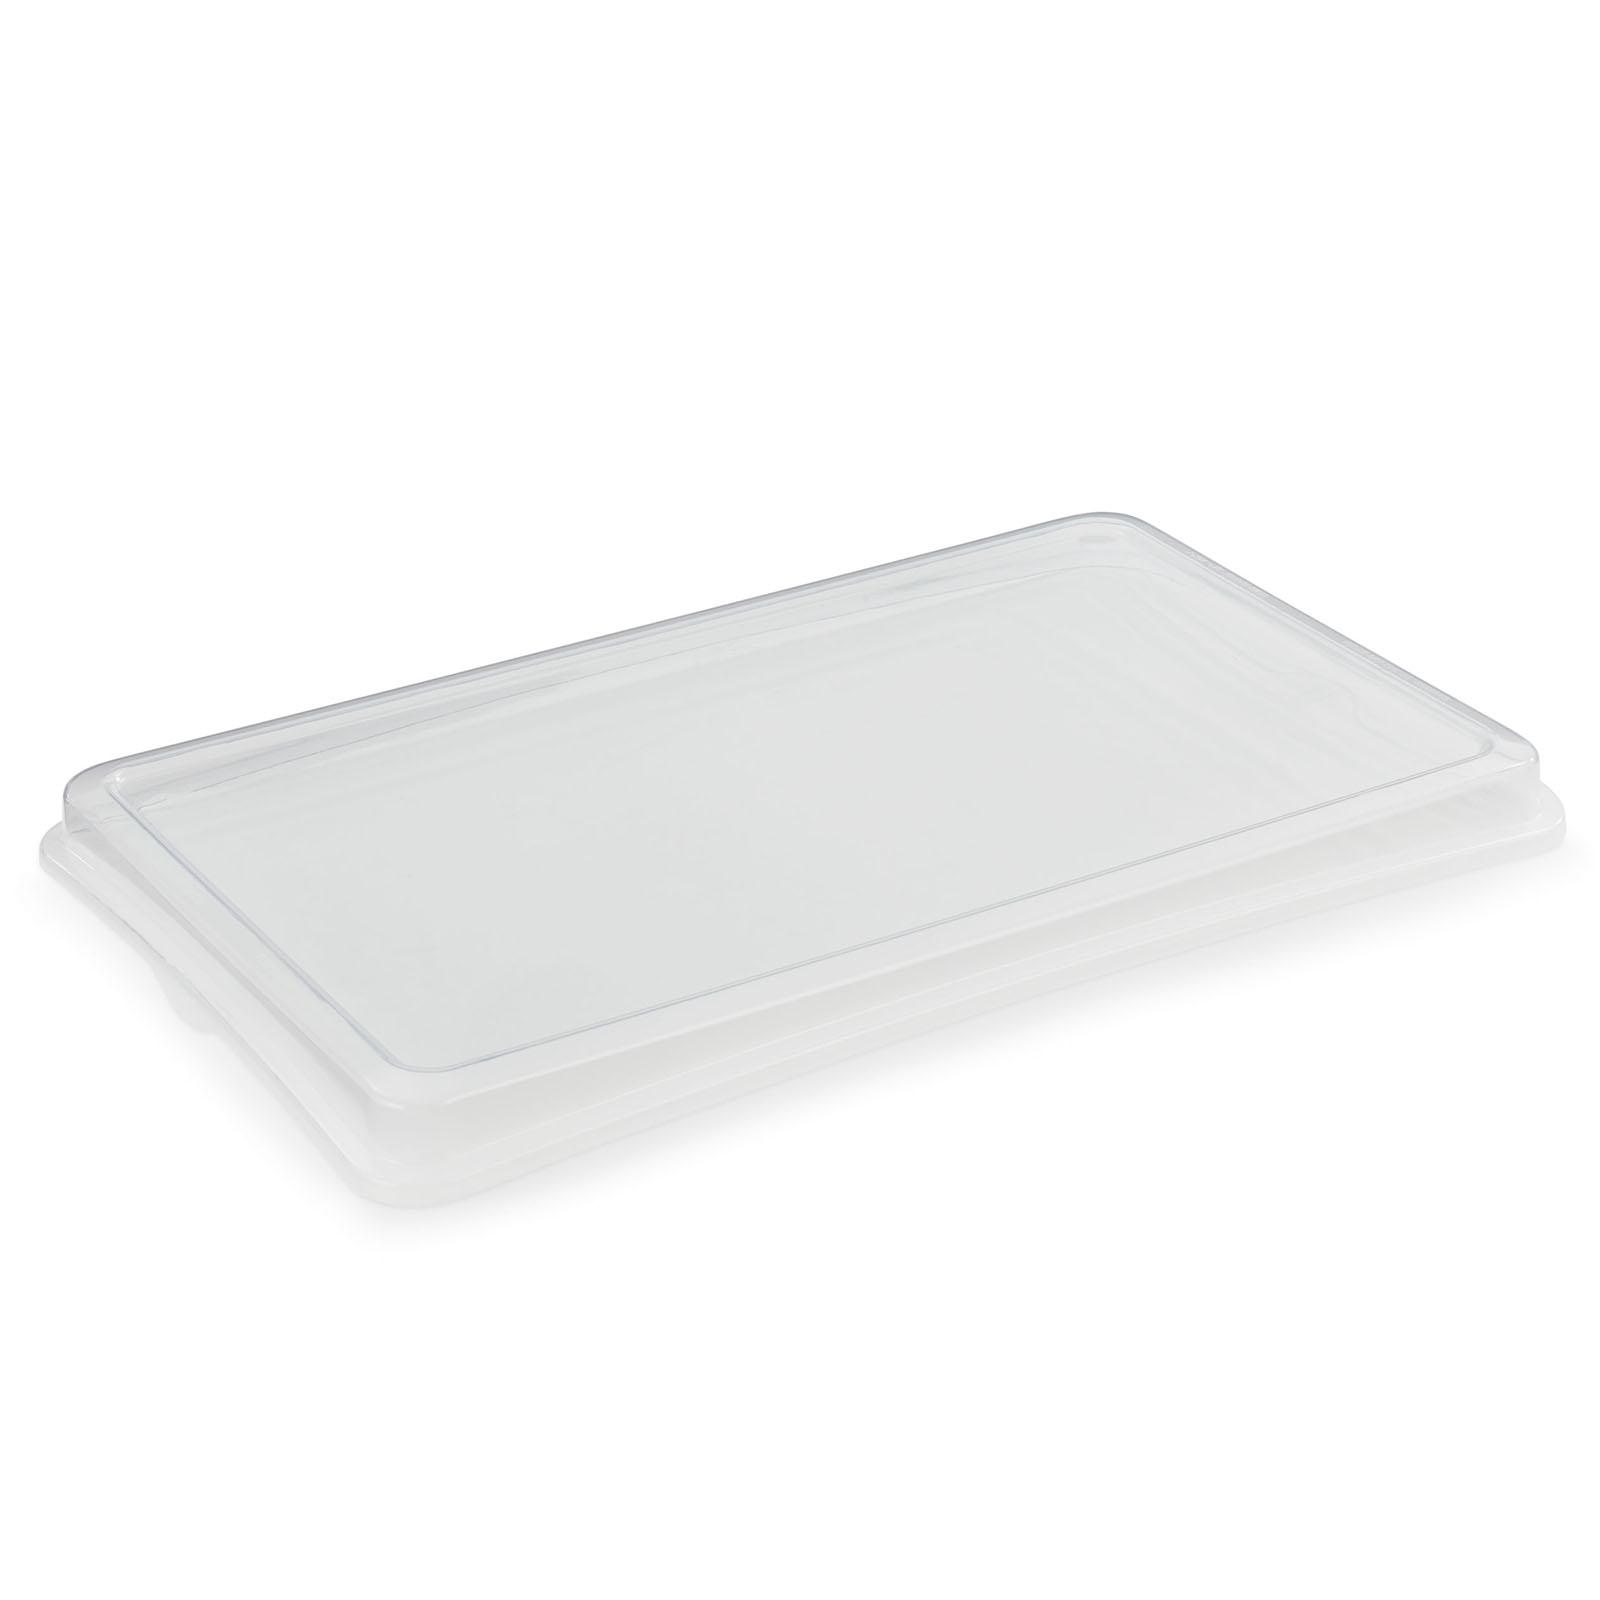 Vollrath 40060 food pan cover, plastic